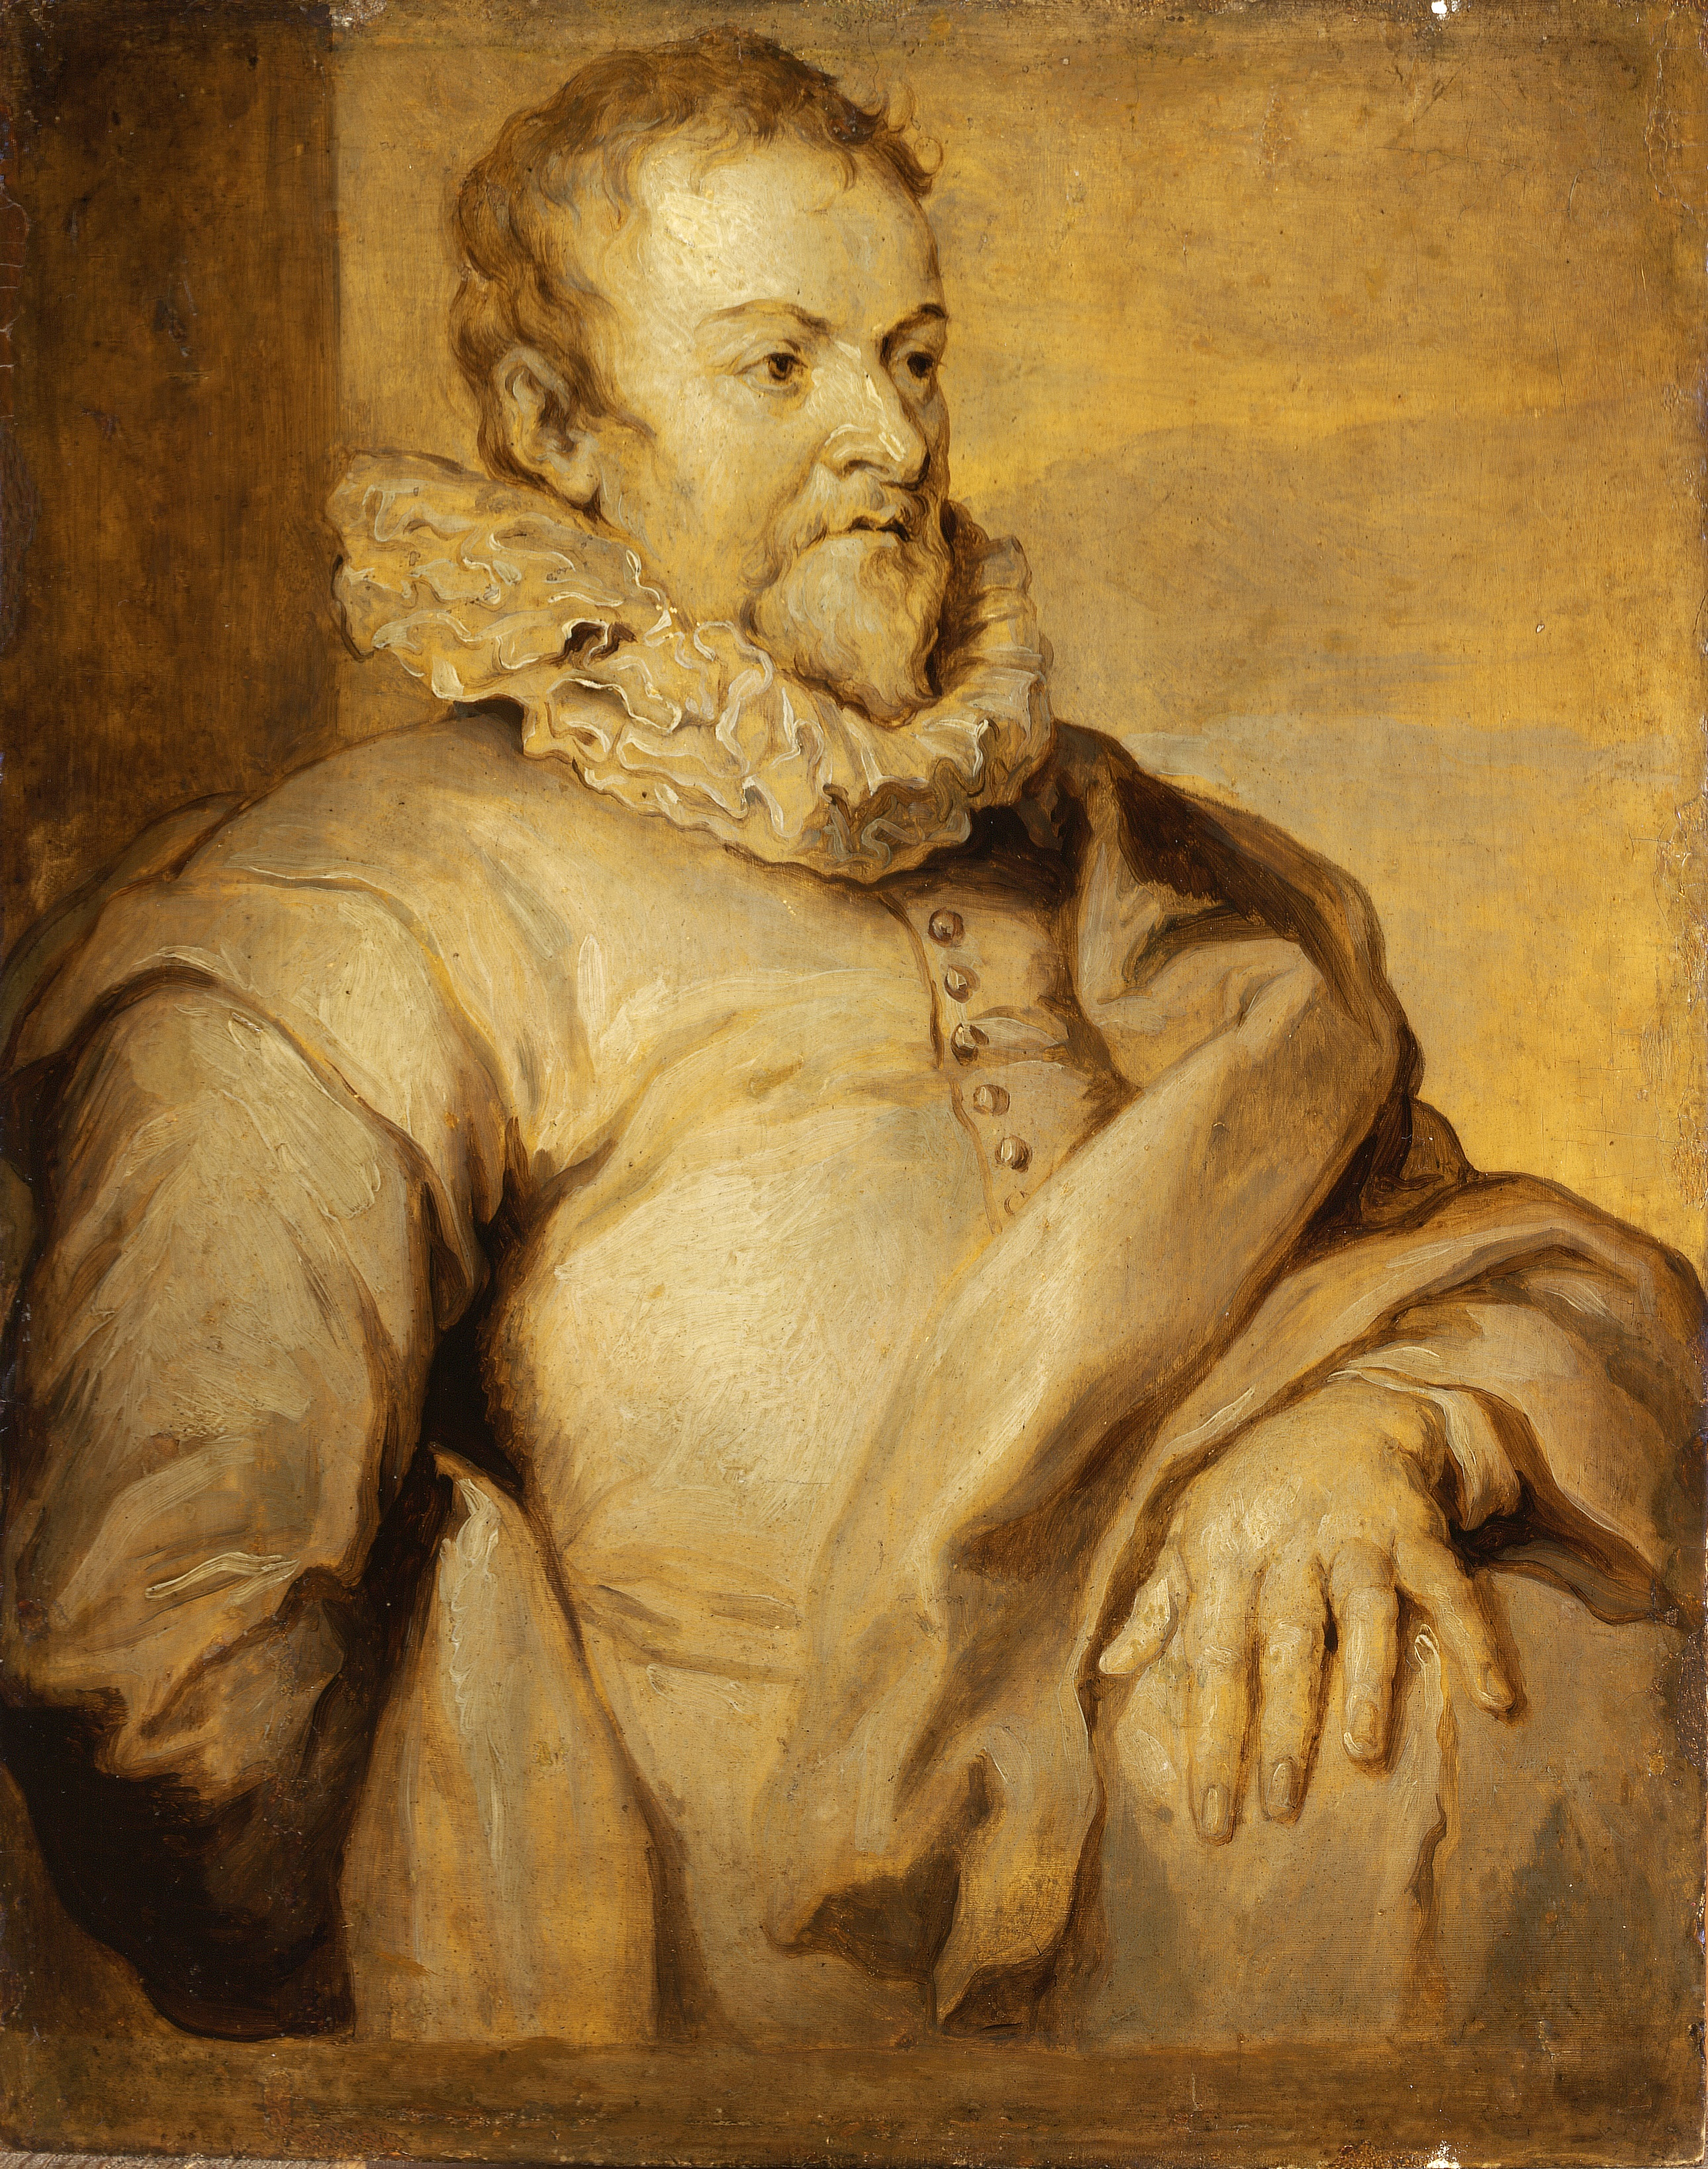 Jan van Ravesteyn (c. 1570-1657)